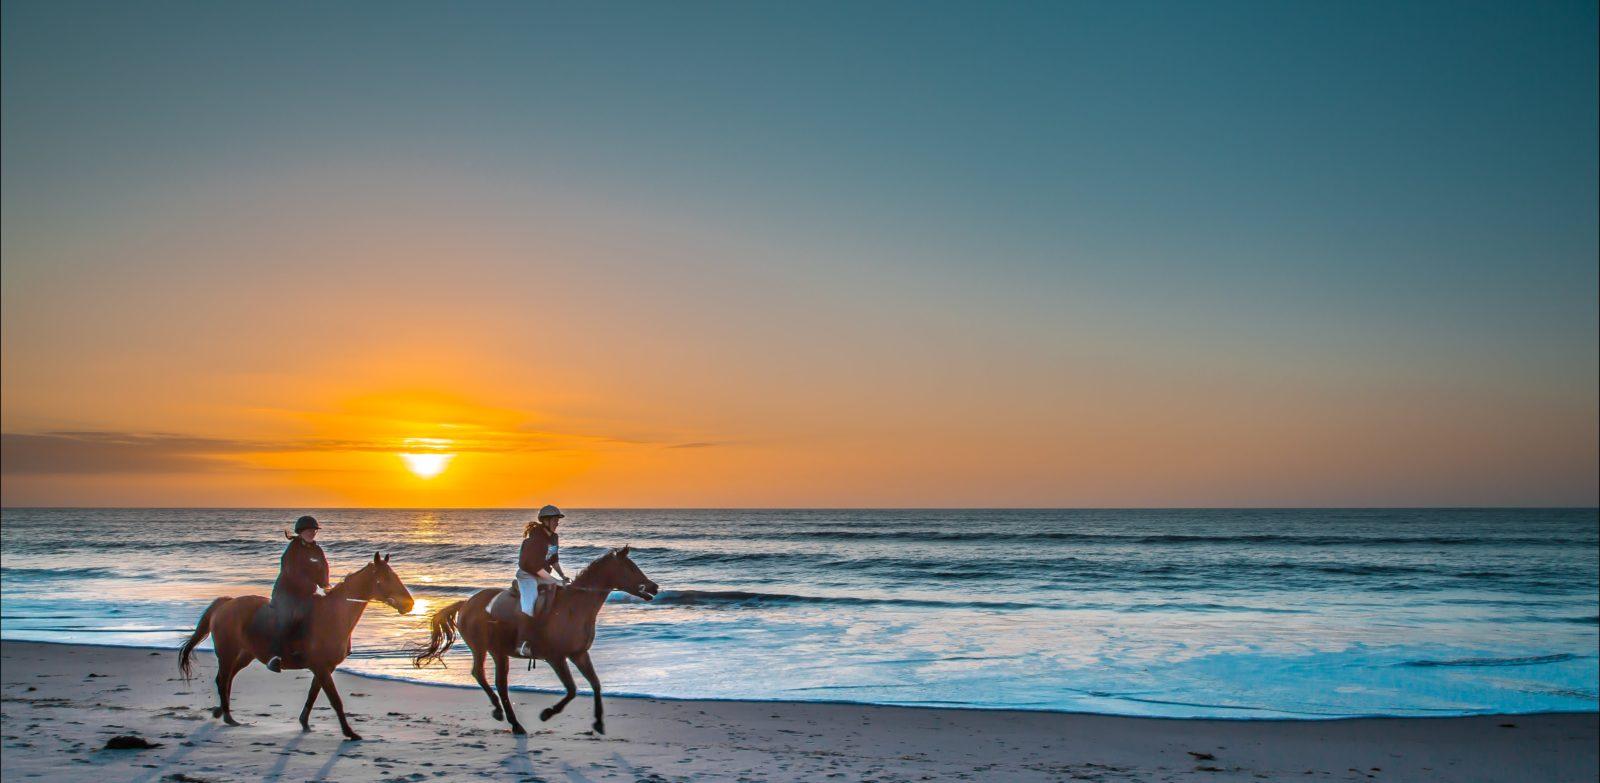 Horse riding on the beach south australia